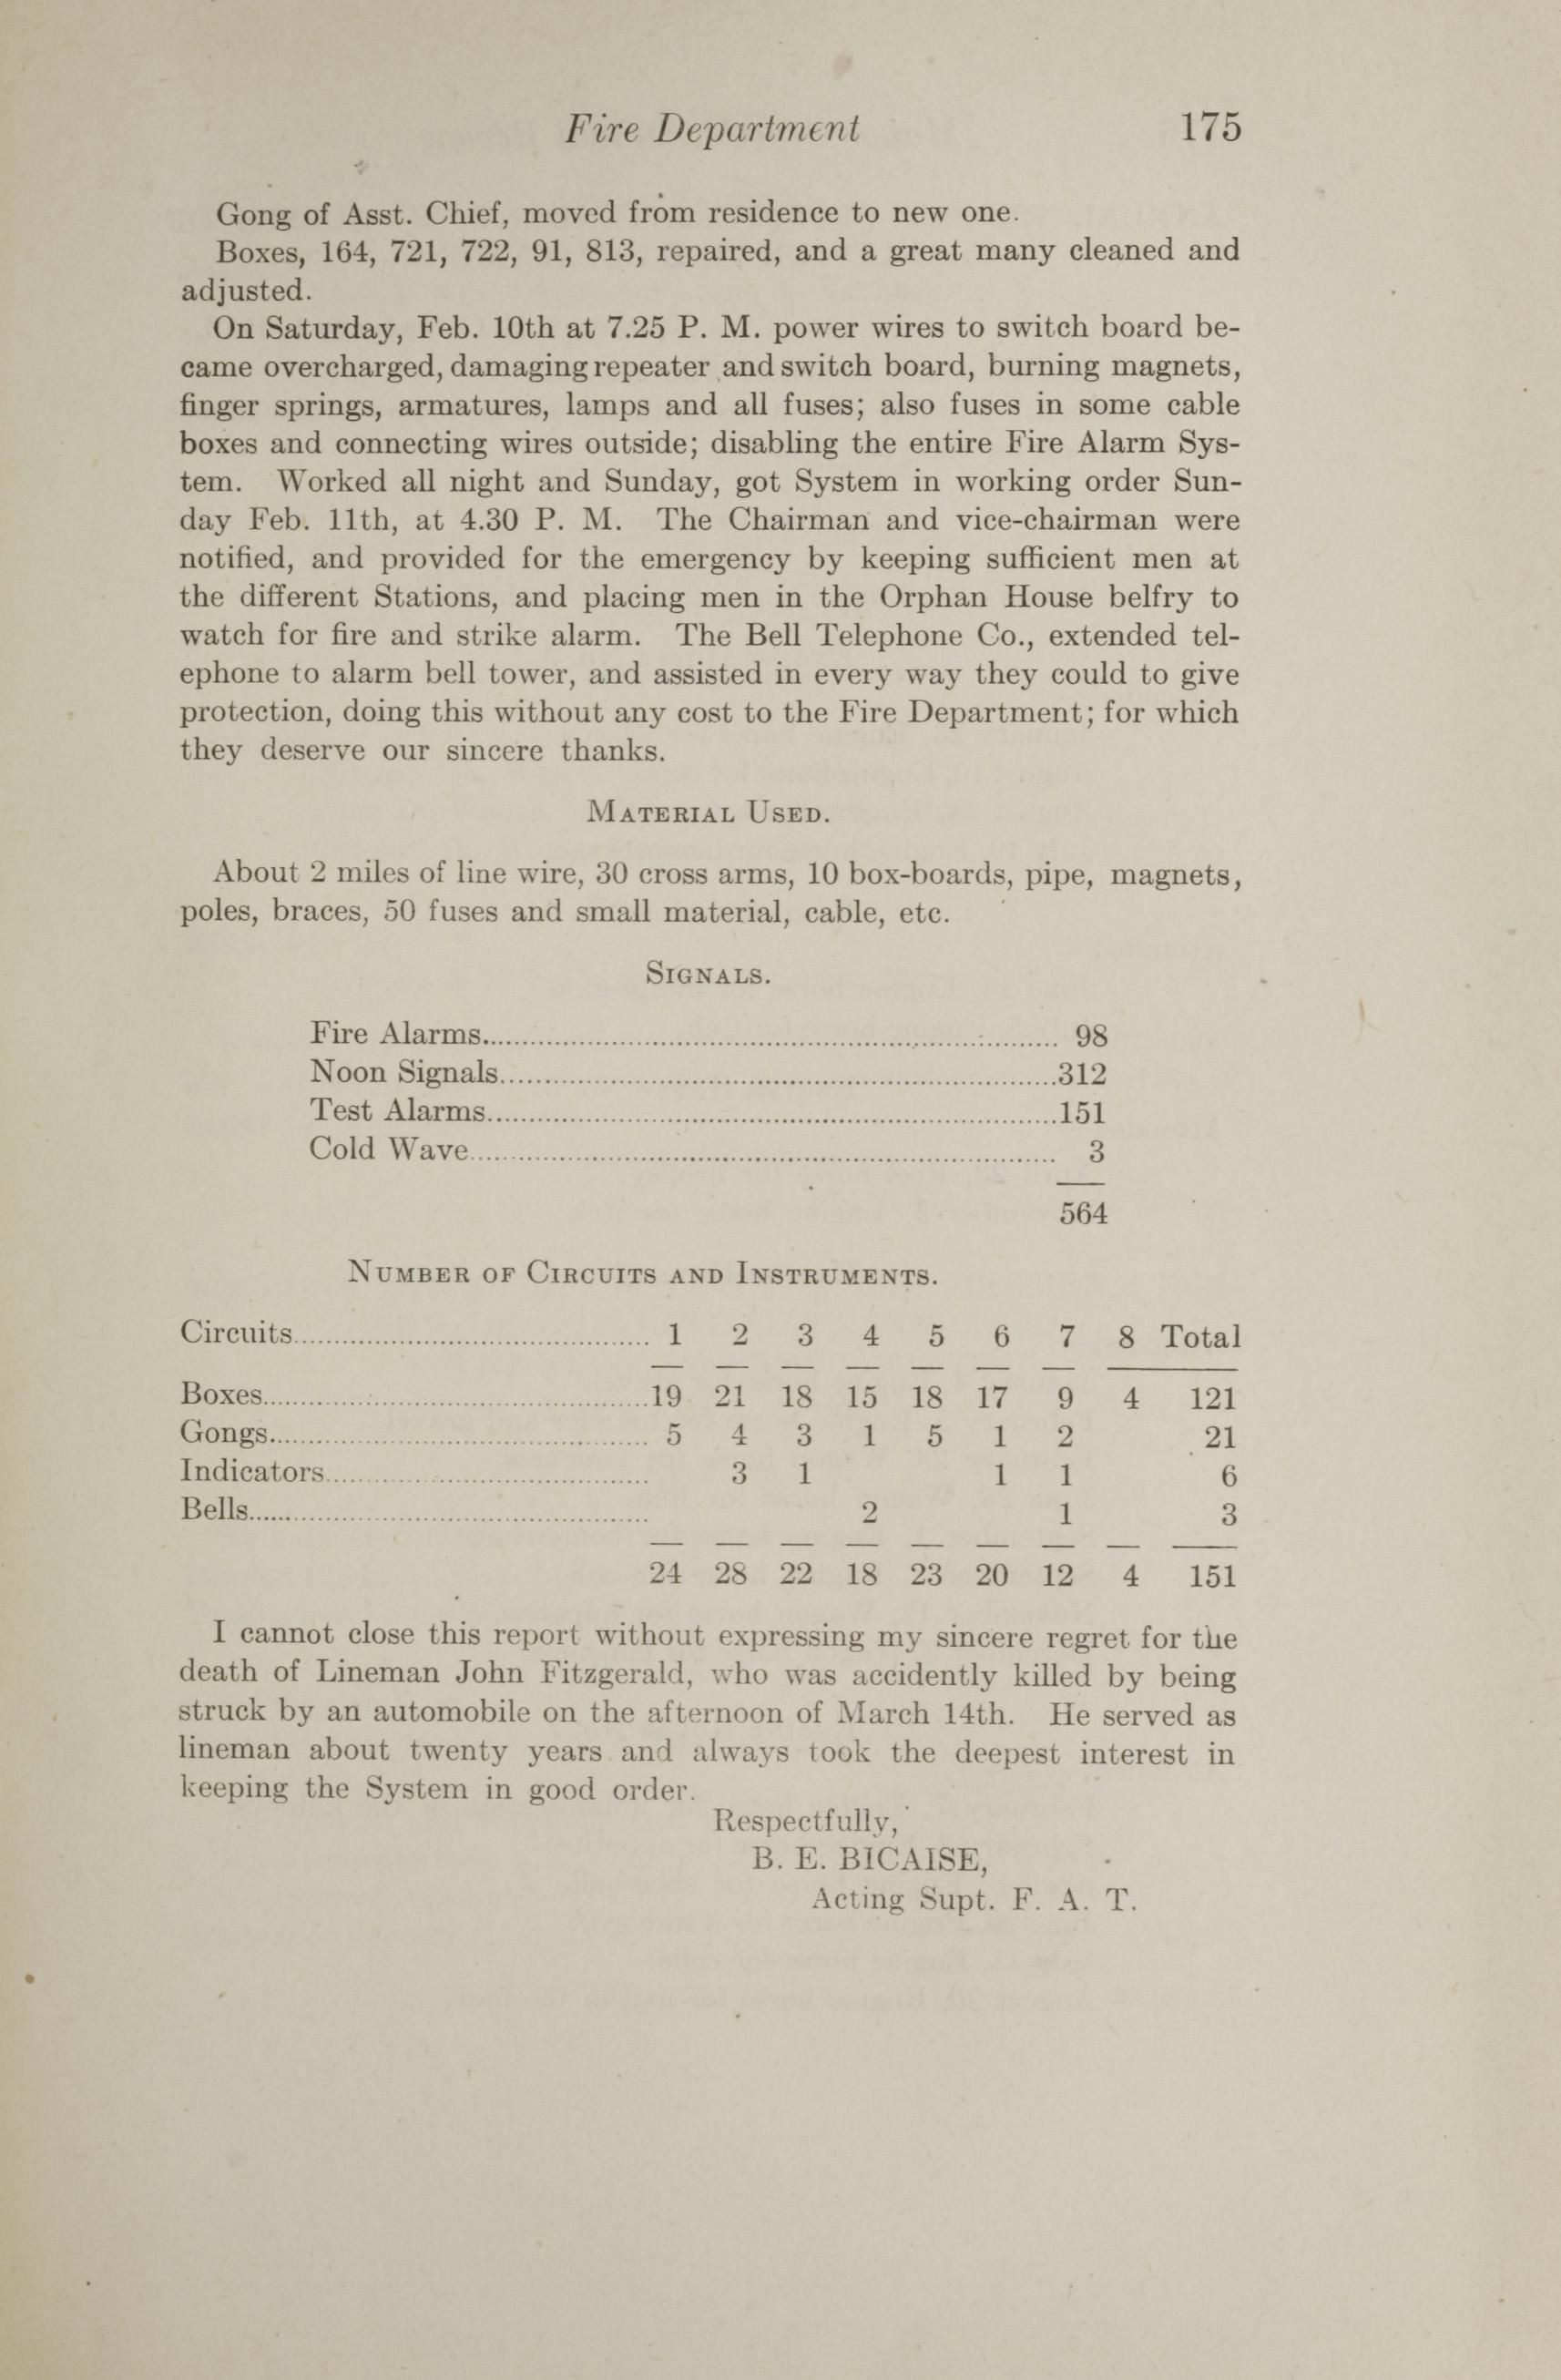 Charleston Yearbook, 1912, page 175